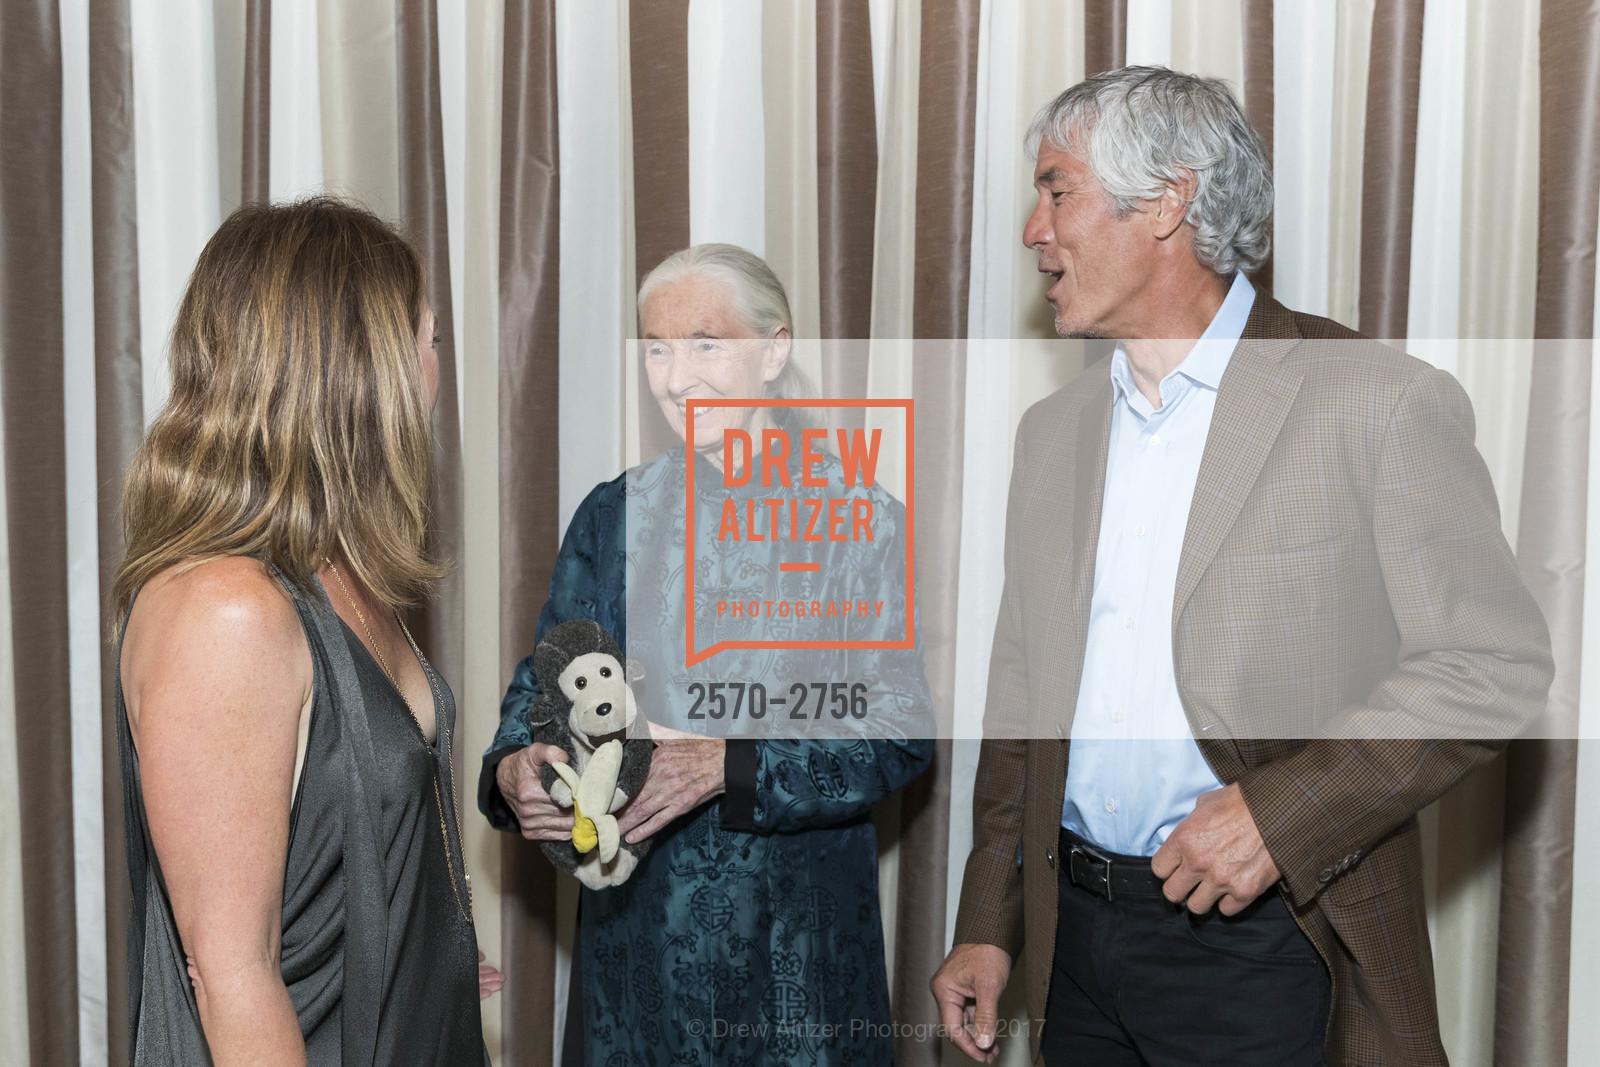 Kristin Coates, Jane Goodall, Morgan Guenther, Photo #2570-2756